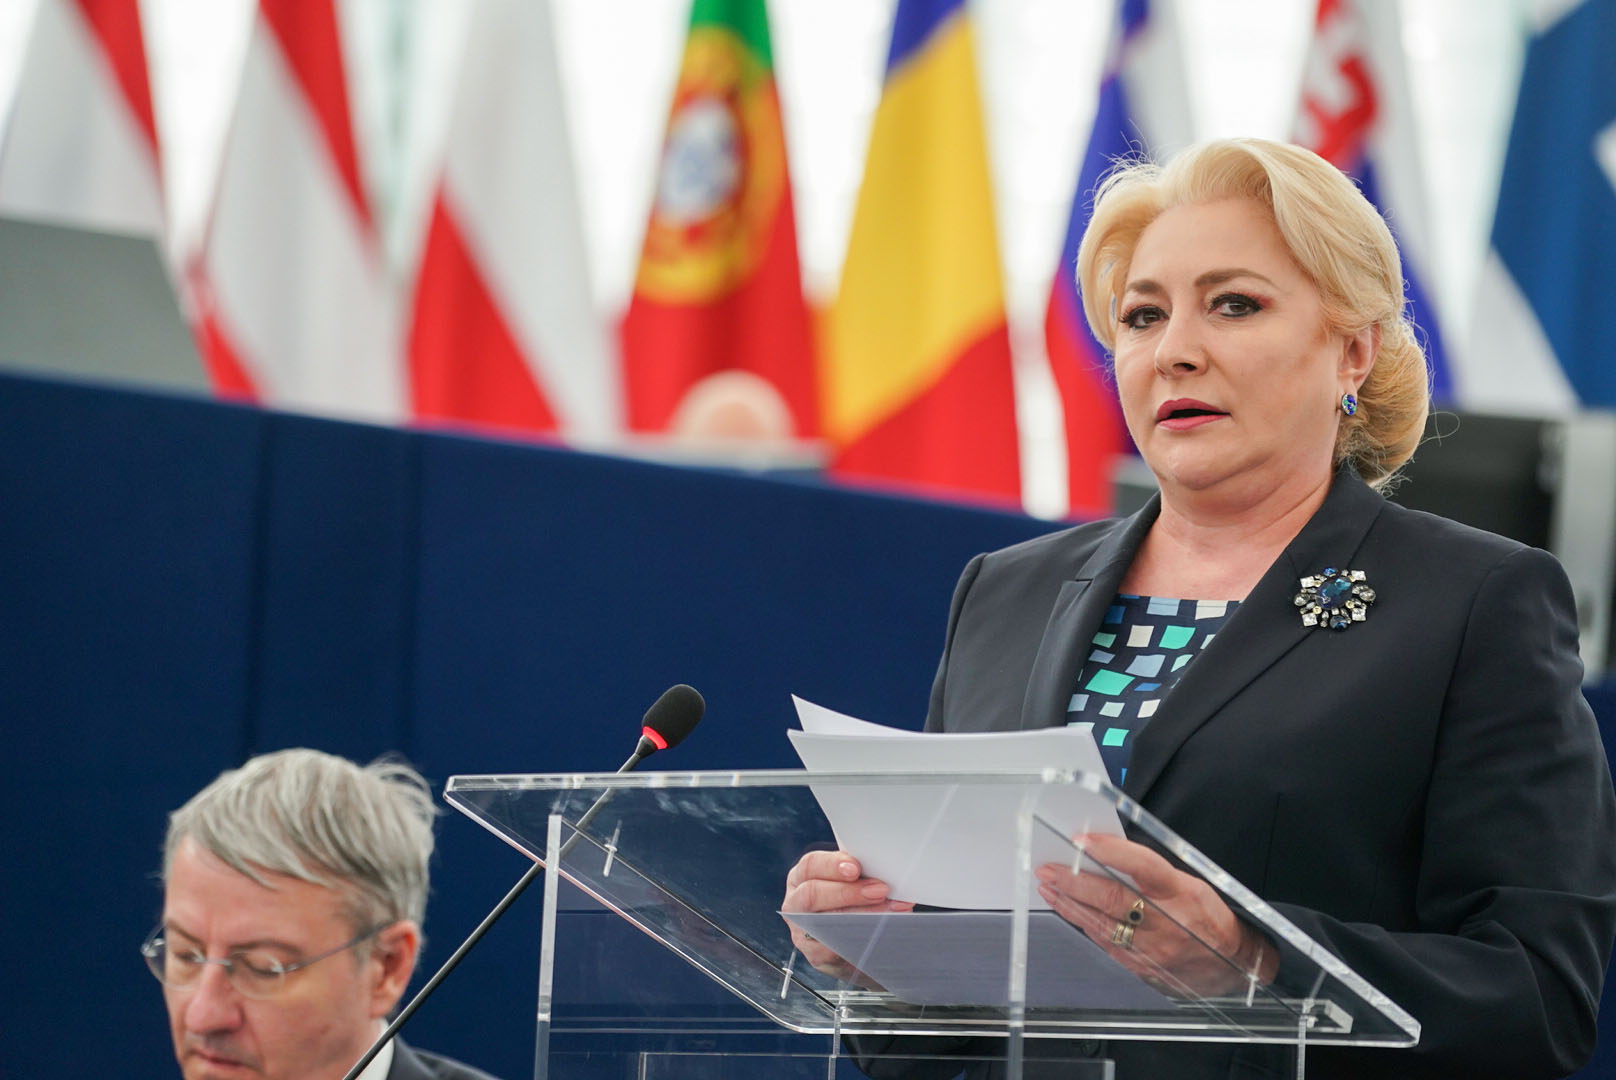 Viorica Dancila briefs the European Parliament on the Romanian presidency